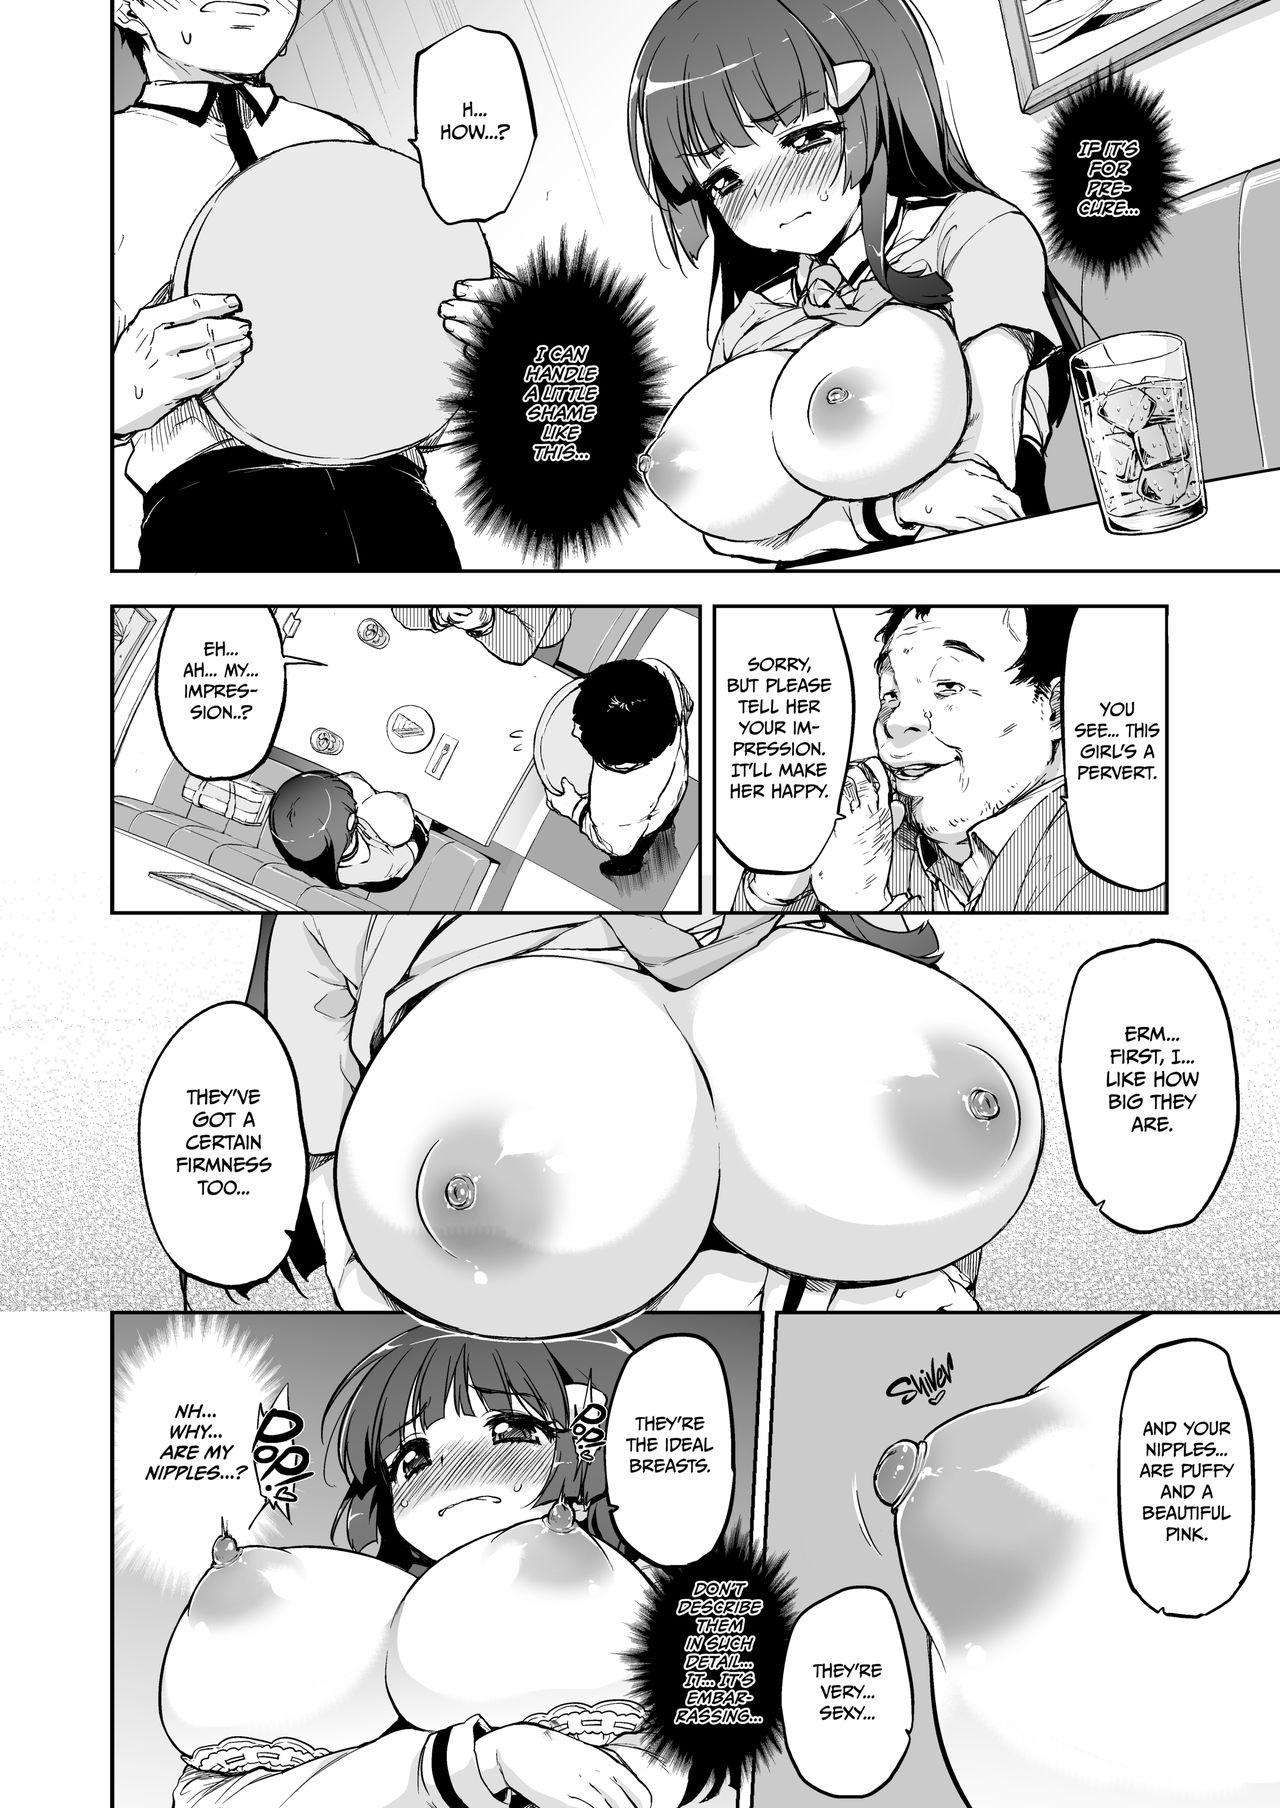 [Muchakai (Mucha)] Odosare Reika-chan | Threatened Reika-chan (Smile Precure!) [English] {2d-market.com} [Decensored] [Digital] 4